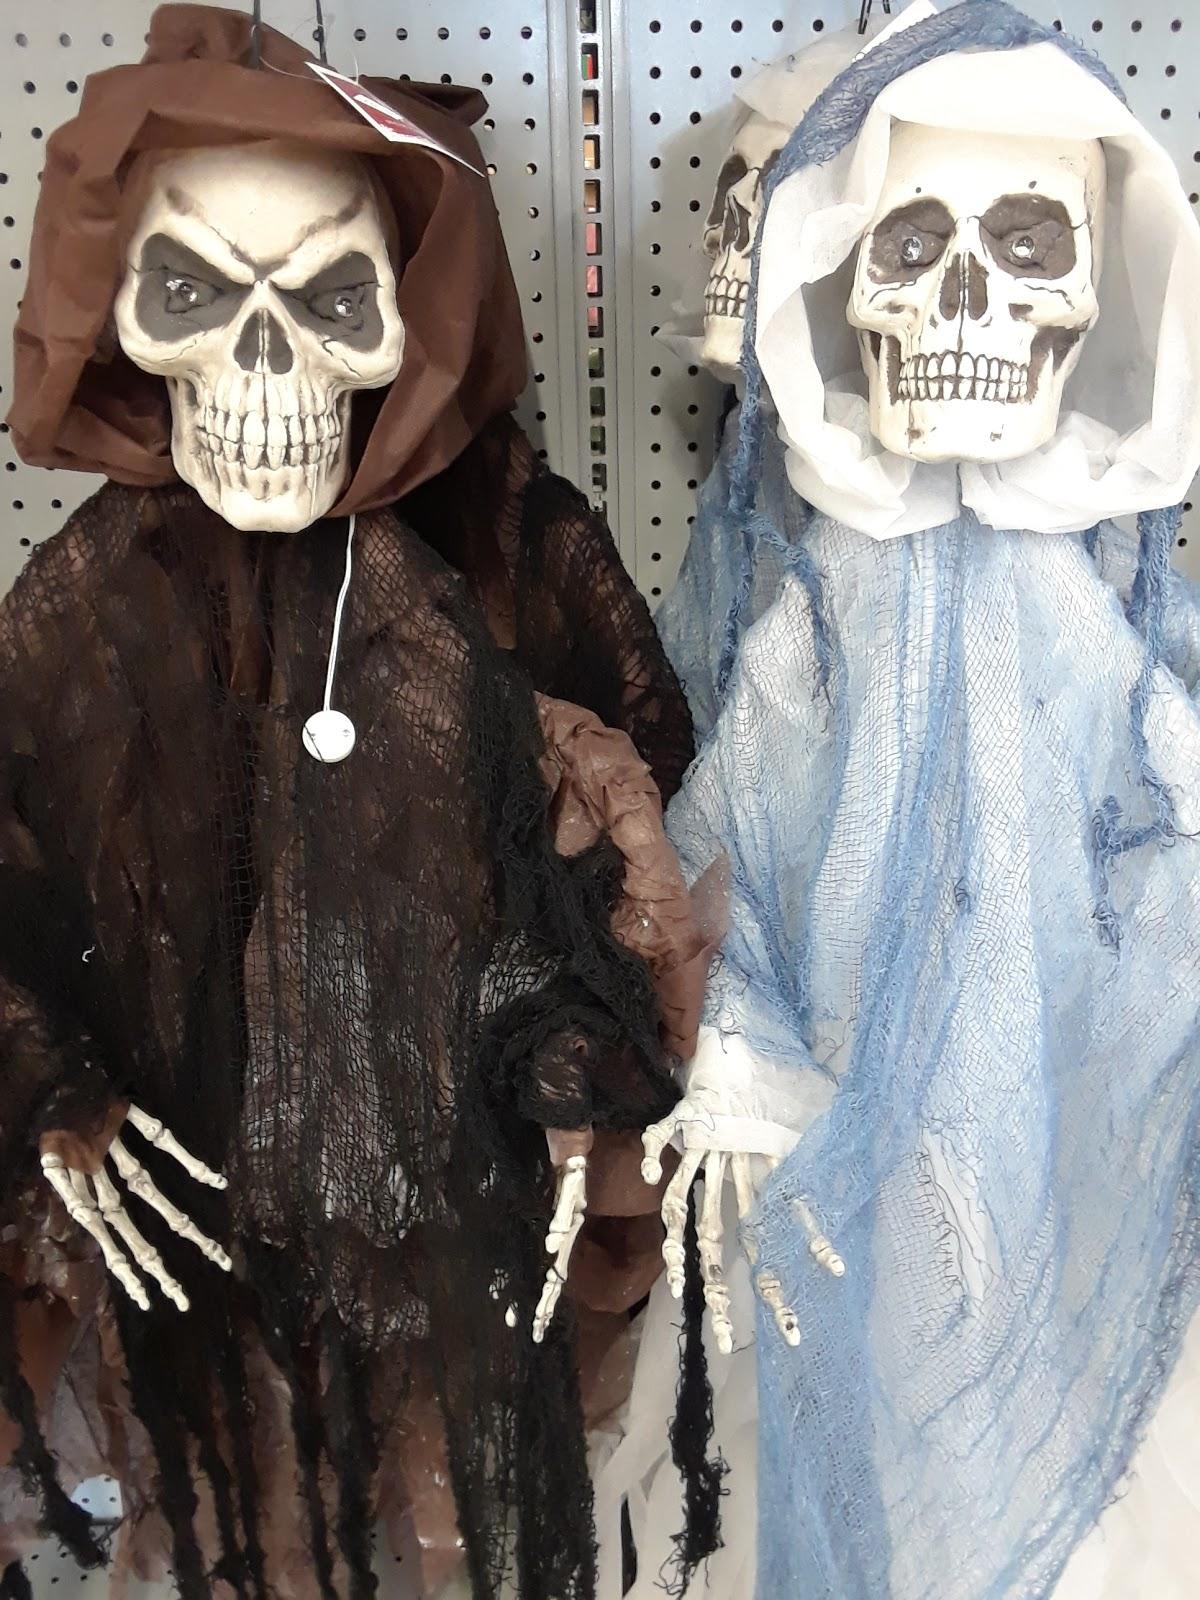 Skeleton Decorations On Display